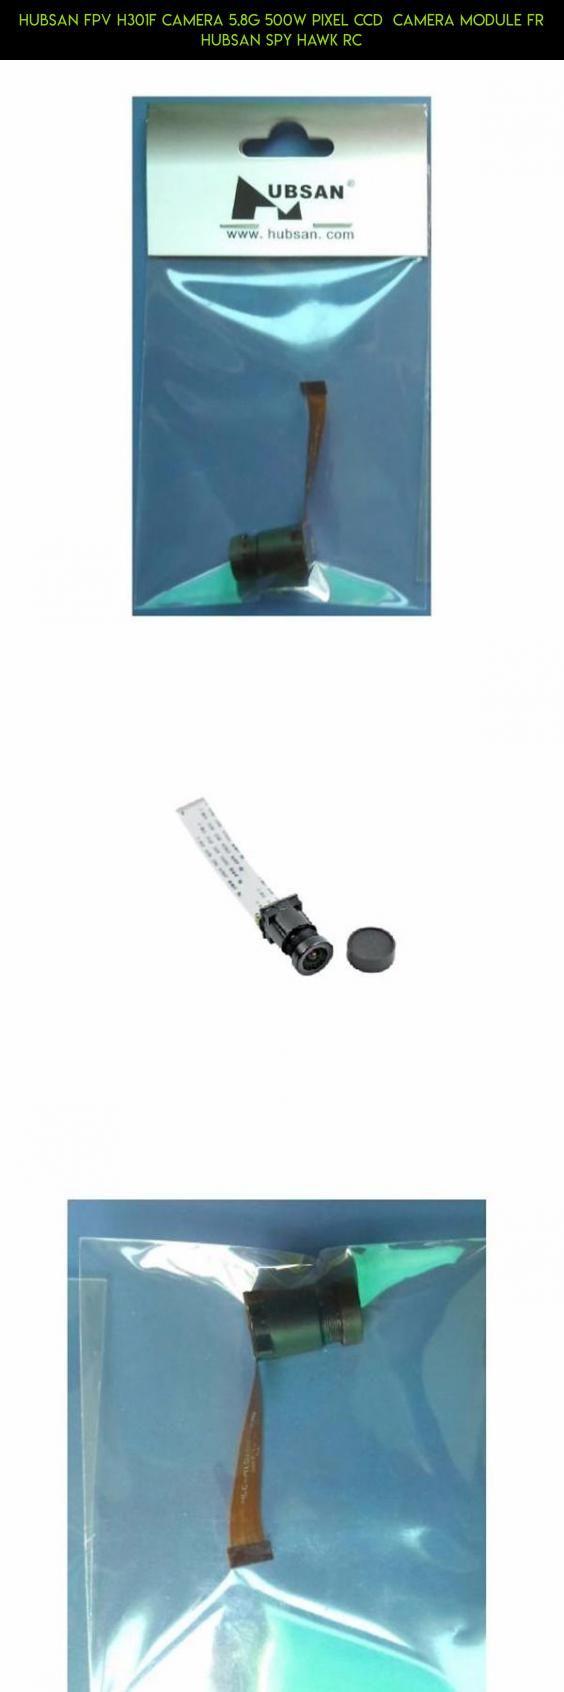 Hubsan FPV H301F Camera 5.8G 500W Pixel CCD  Camera Module fr Hubsan Spy Hawk RC #hubsan #shopping #hawk #gadgets #products #racing #parts #tech #drone #spy #kit #technology #fpv #camera #plans